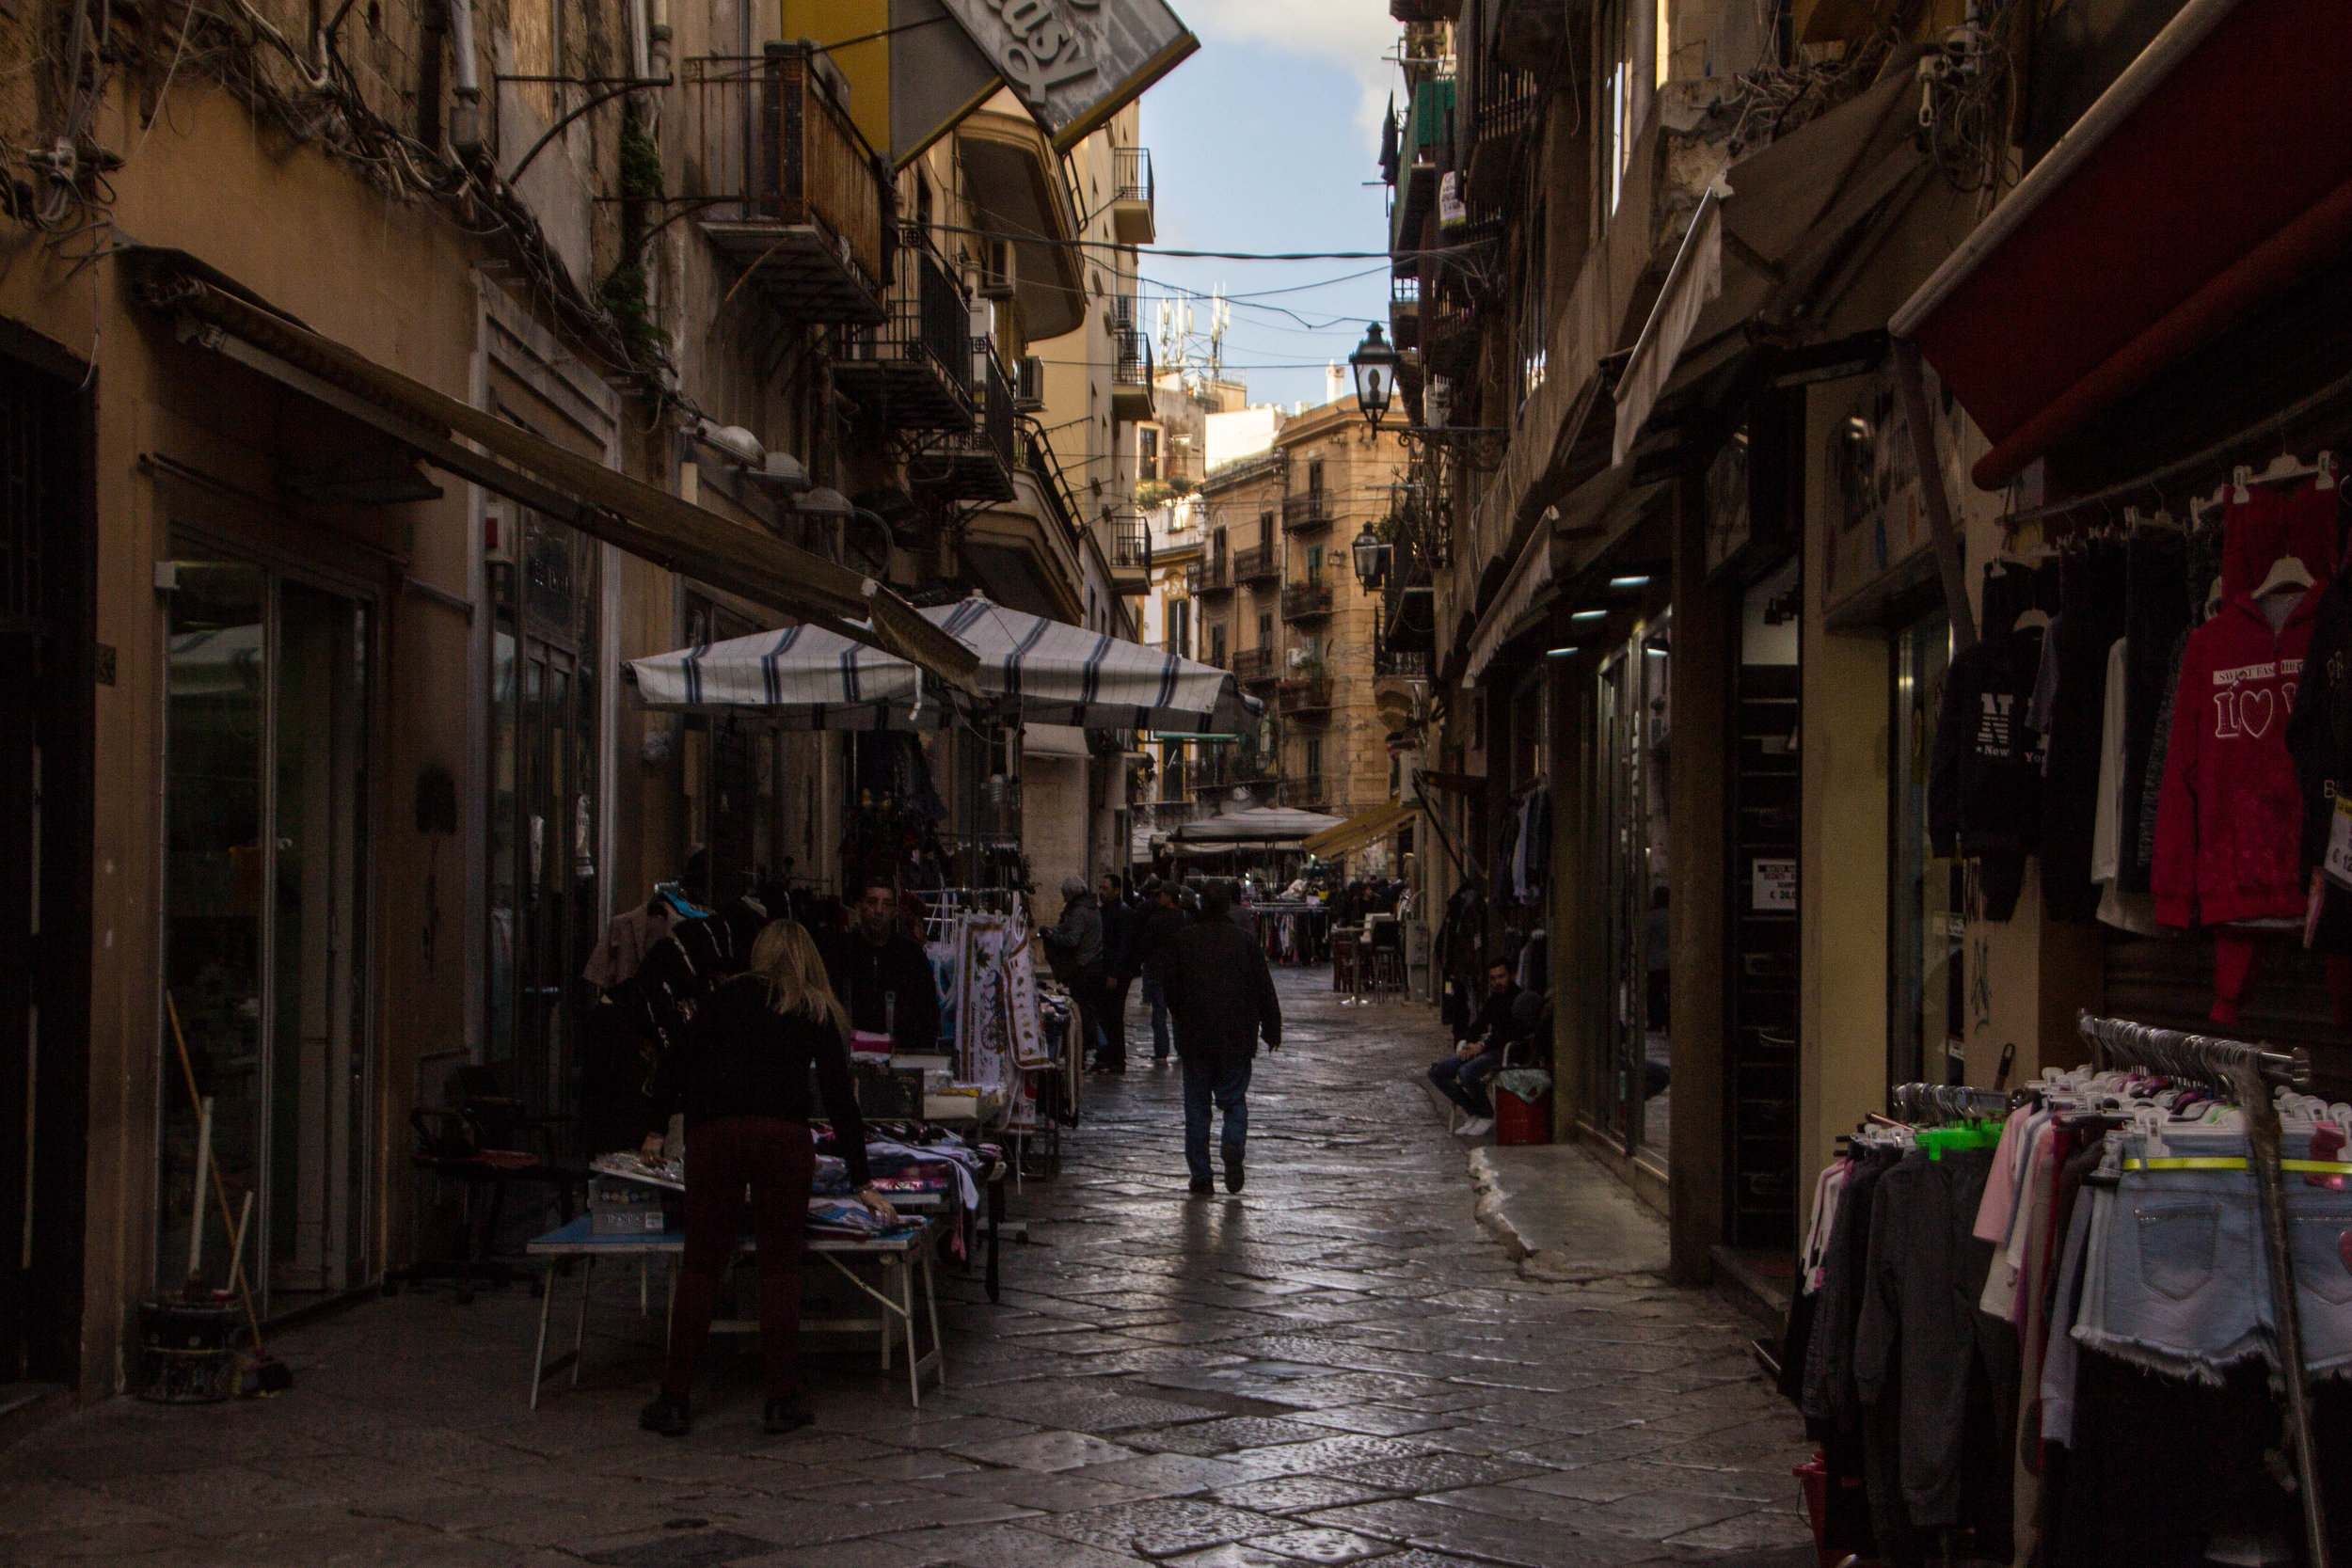 street-photography-palermo-sicily-53.jpg